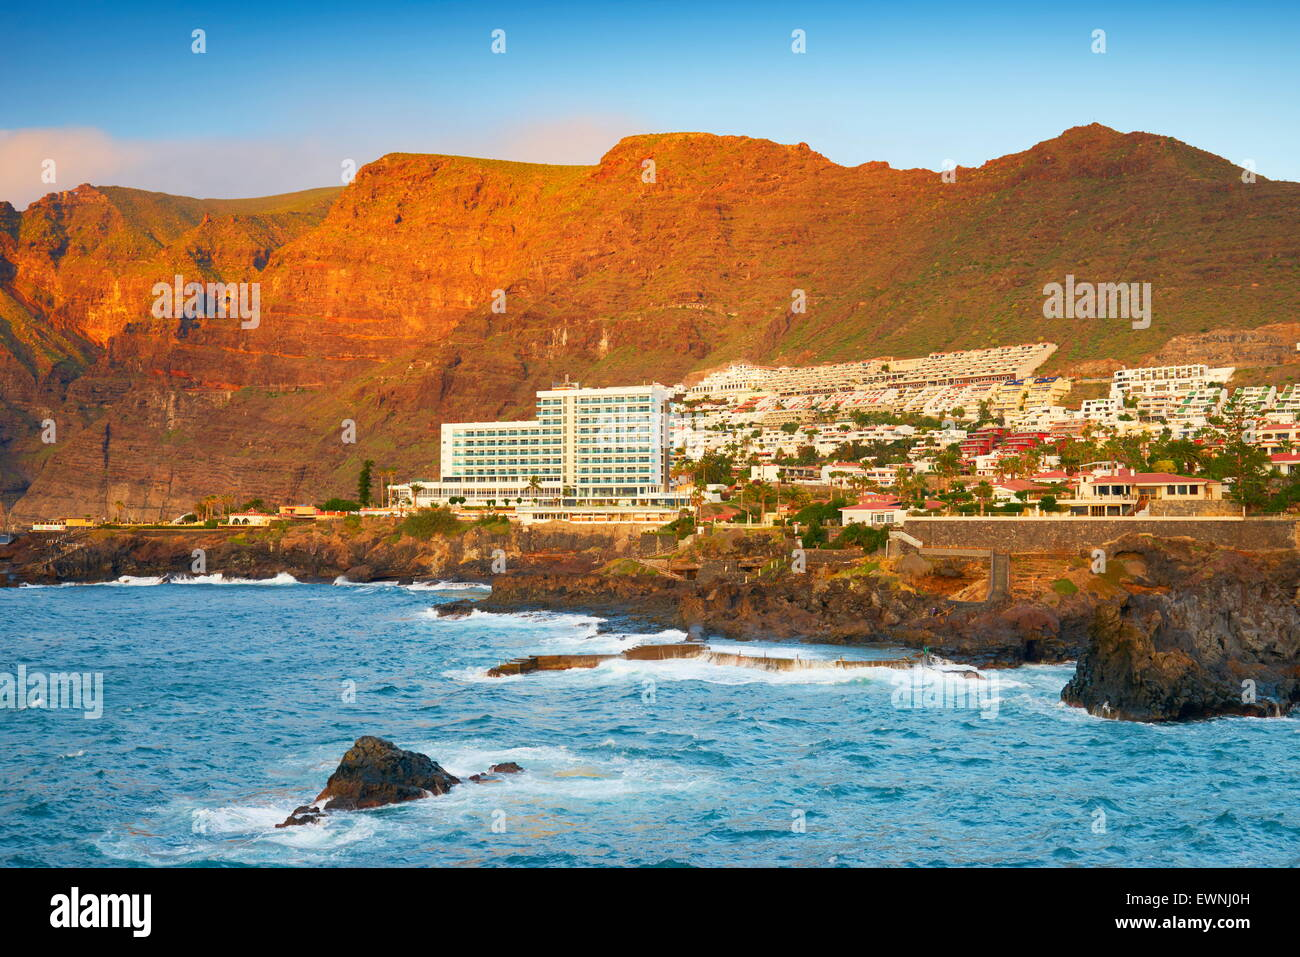 Los Gigantes Klippen, Teneriffa, Kanarische Inseln, Spanien Stockfoto